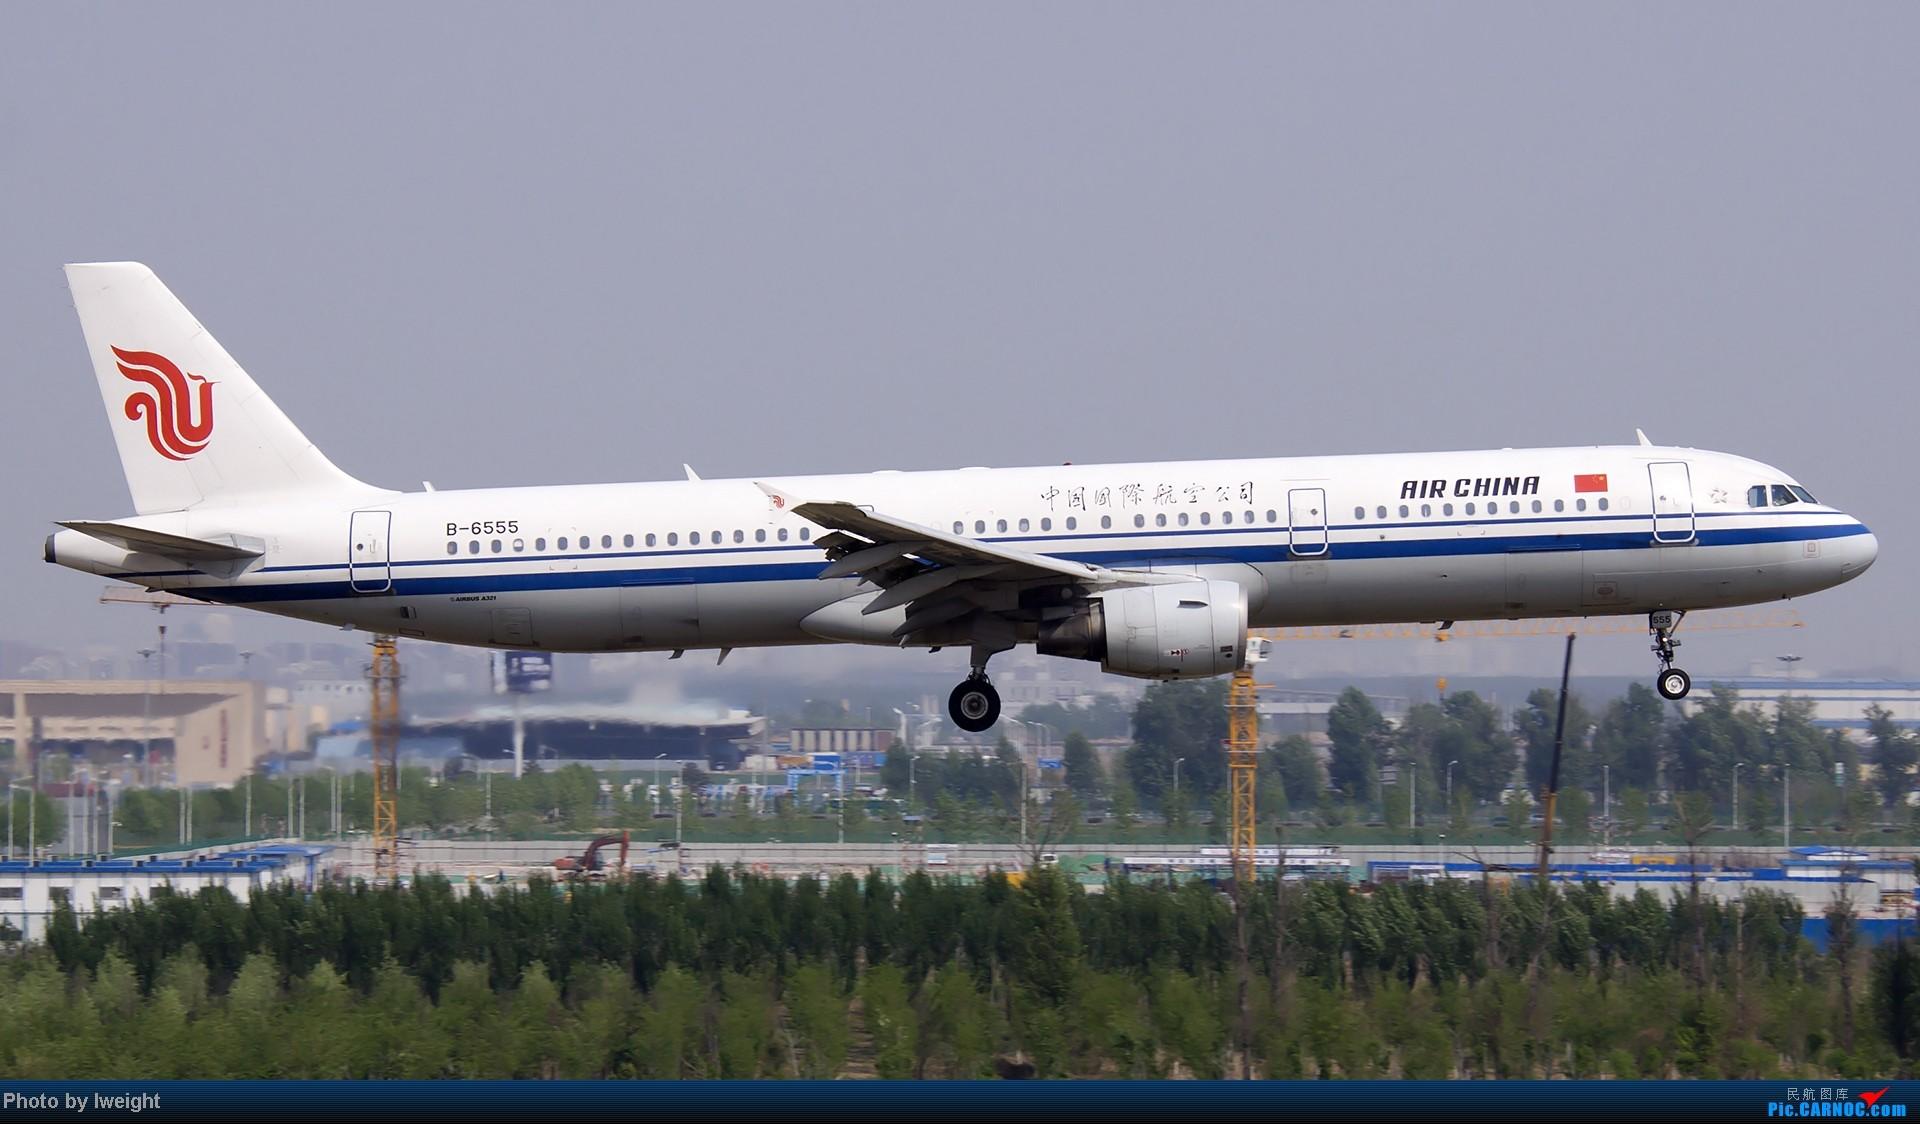 Re:[原创]错过了卡航的巴塞罗那号,只有这些大路货了,泪奔啊 AIRBUS A321-200 B-6555 中国北京首都机场